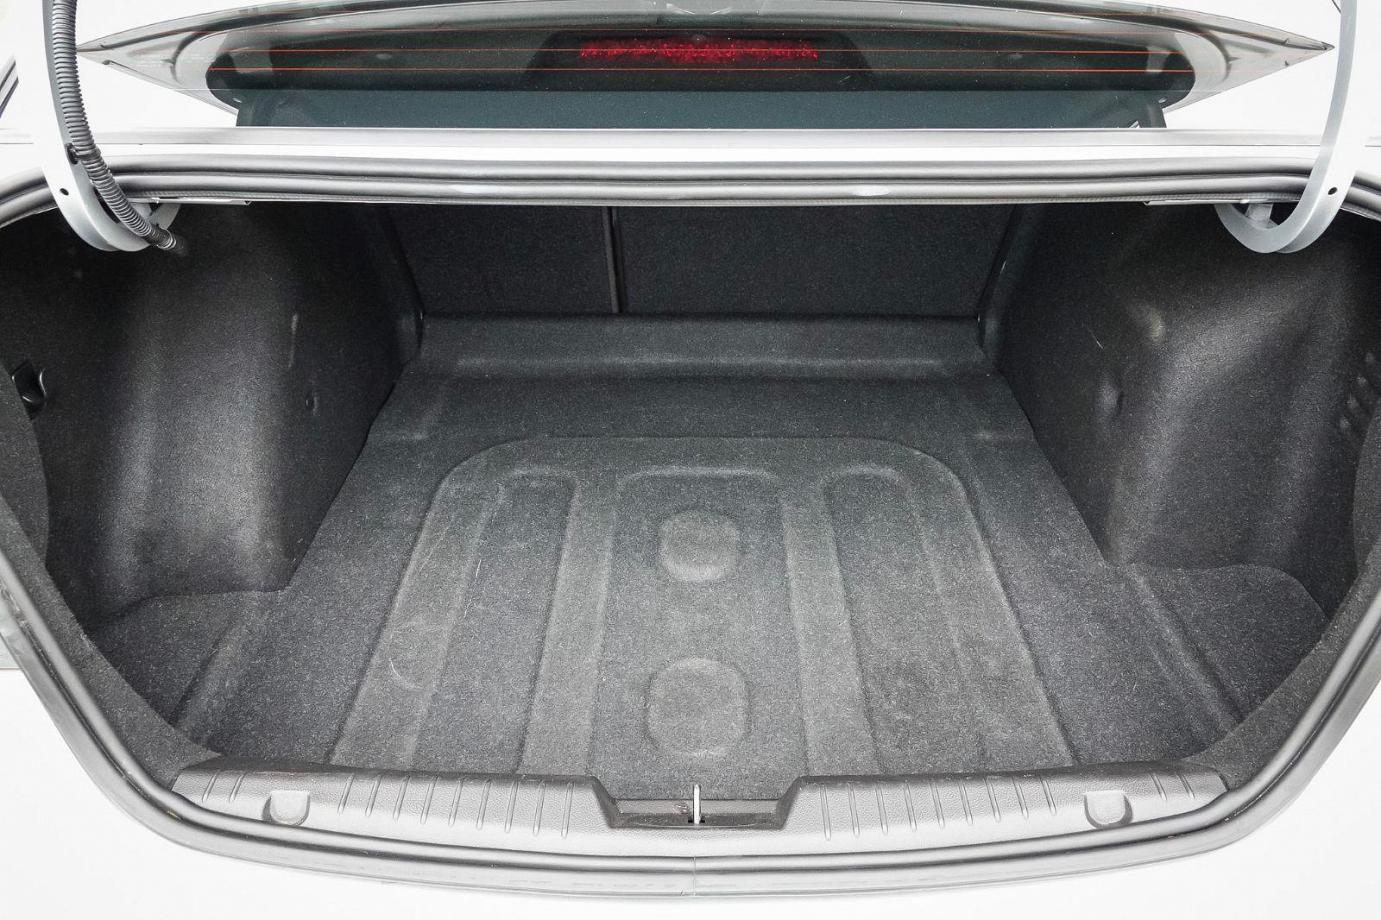 2016 Holden Cruze JH Series II MY16 Z-Series Sedan 4dr Spts Auto 6sp 1.8i